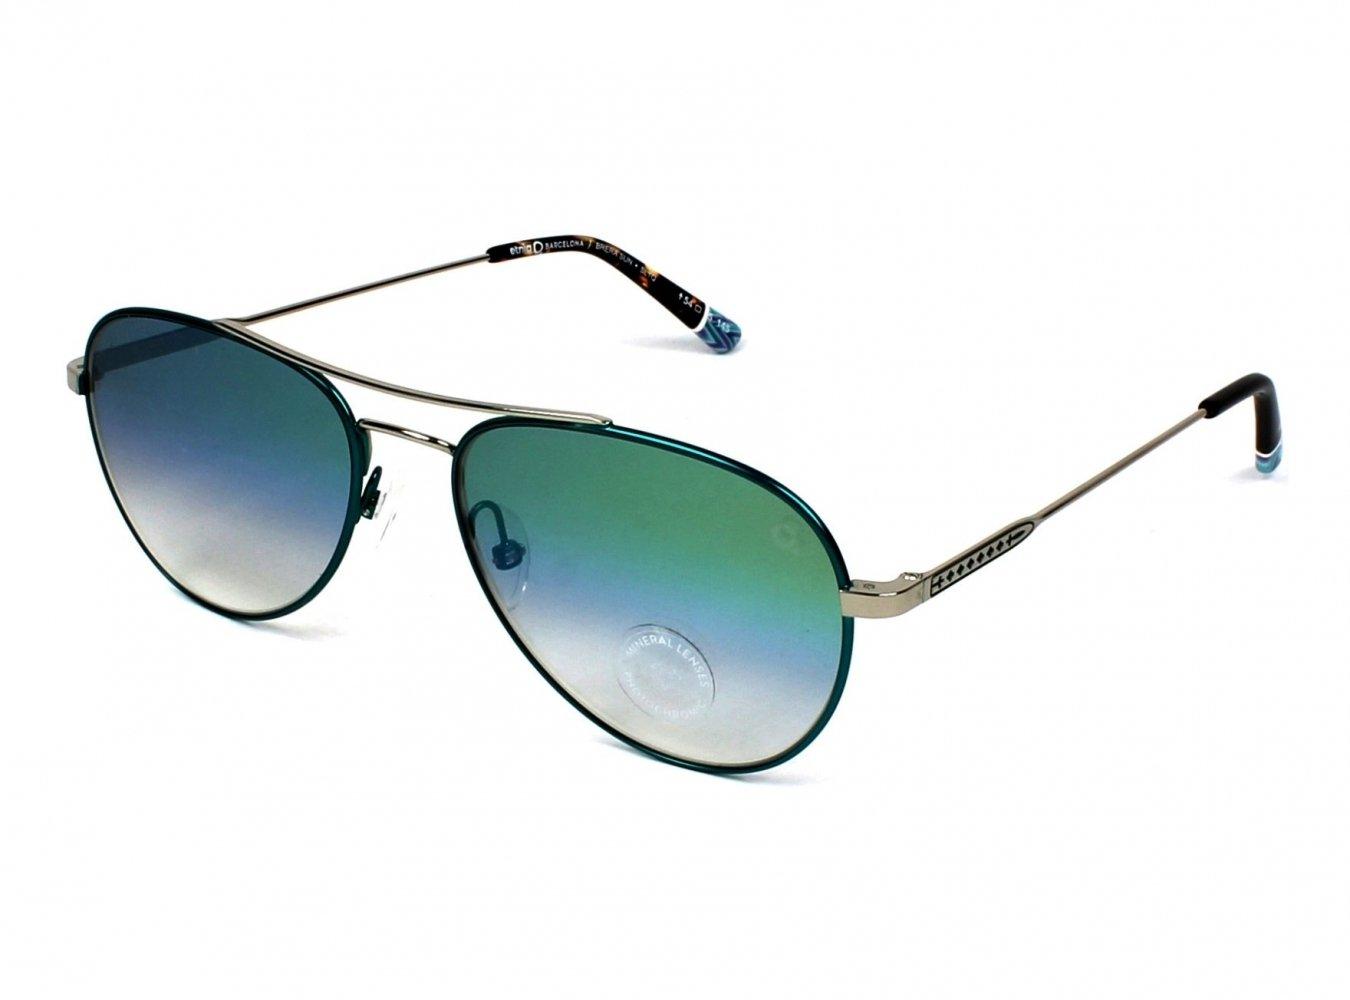 Gafas de sol etnia Barcelona Brera Sun 54 sltq Silver ...